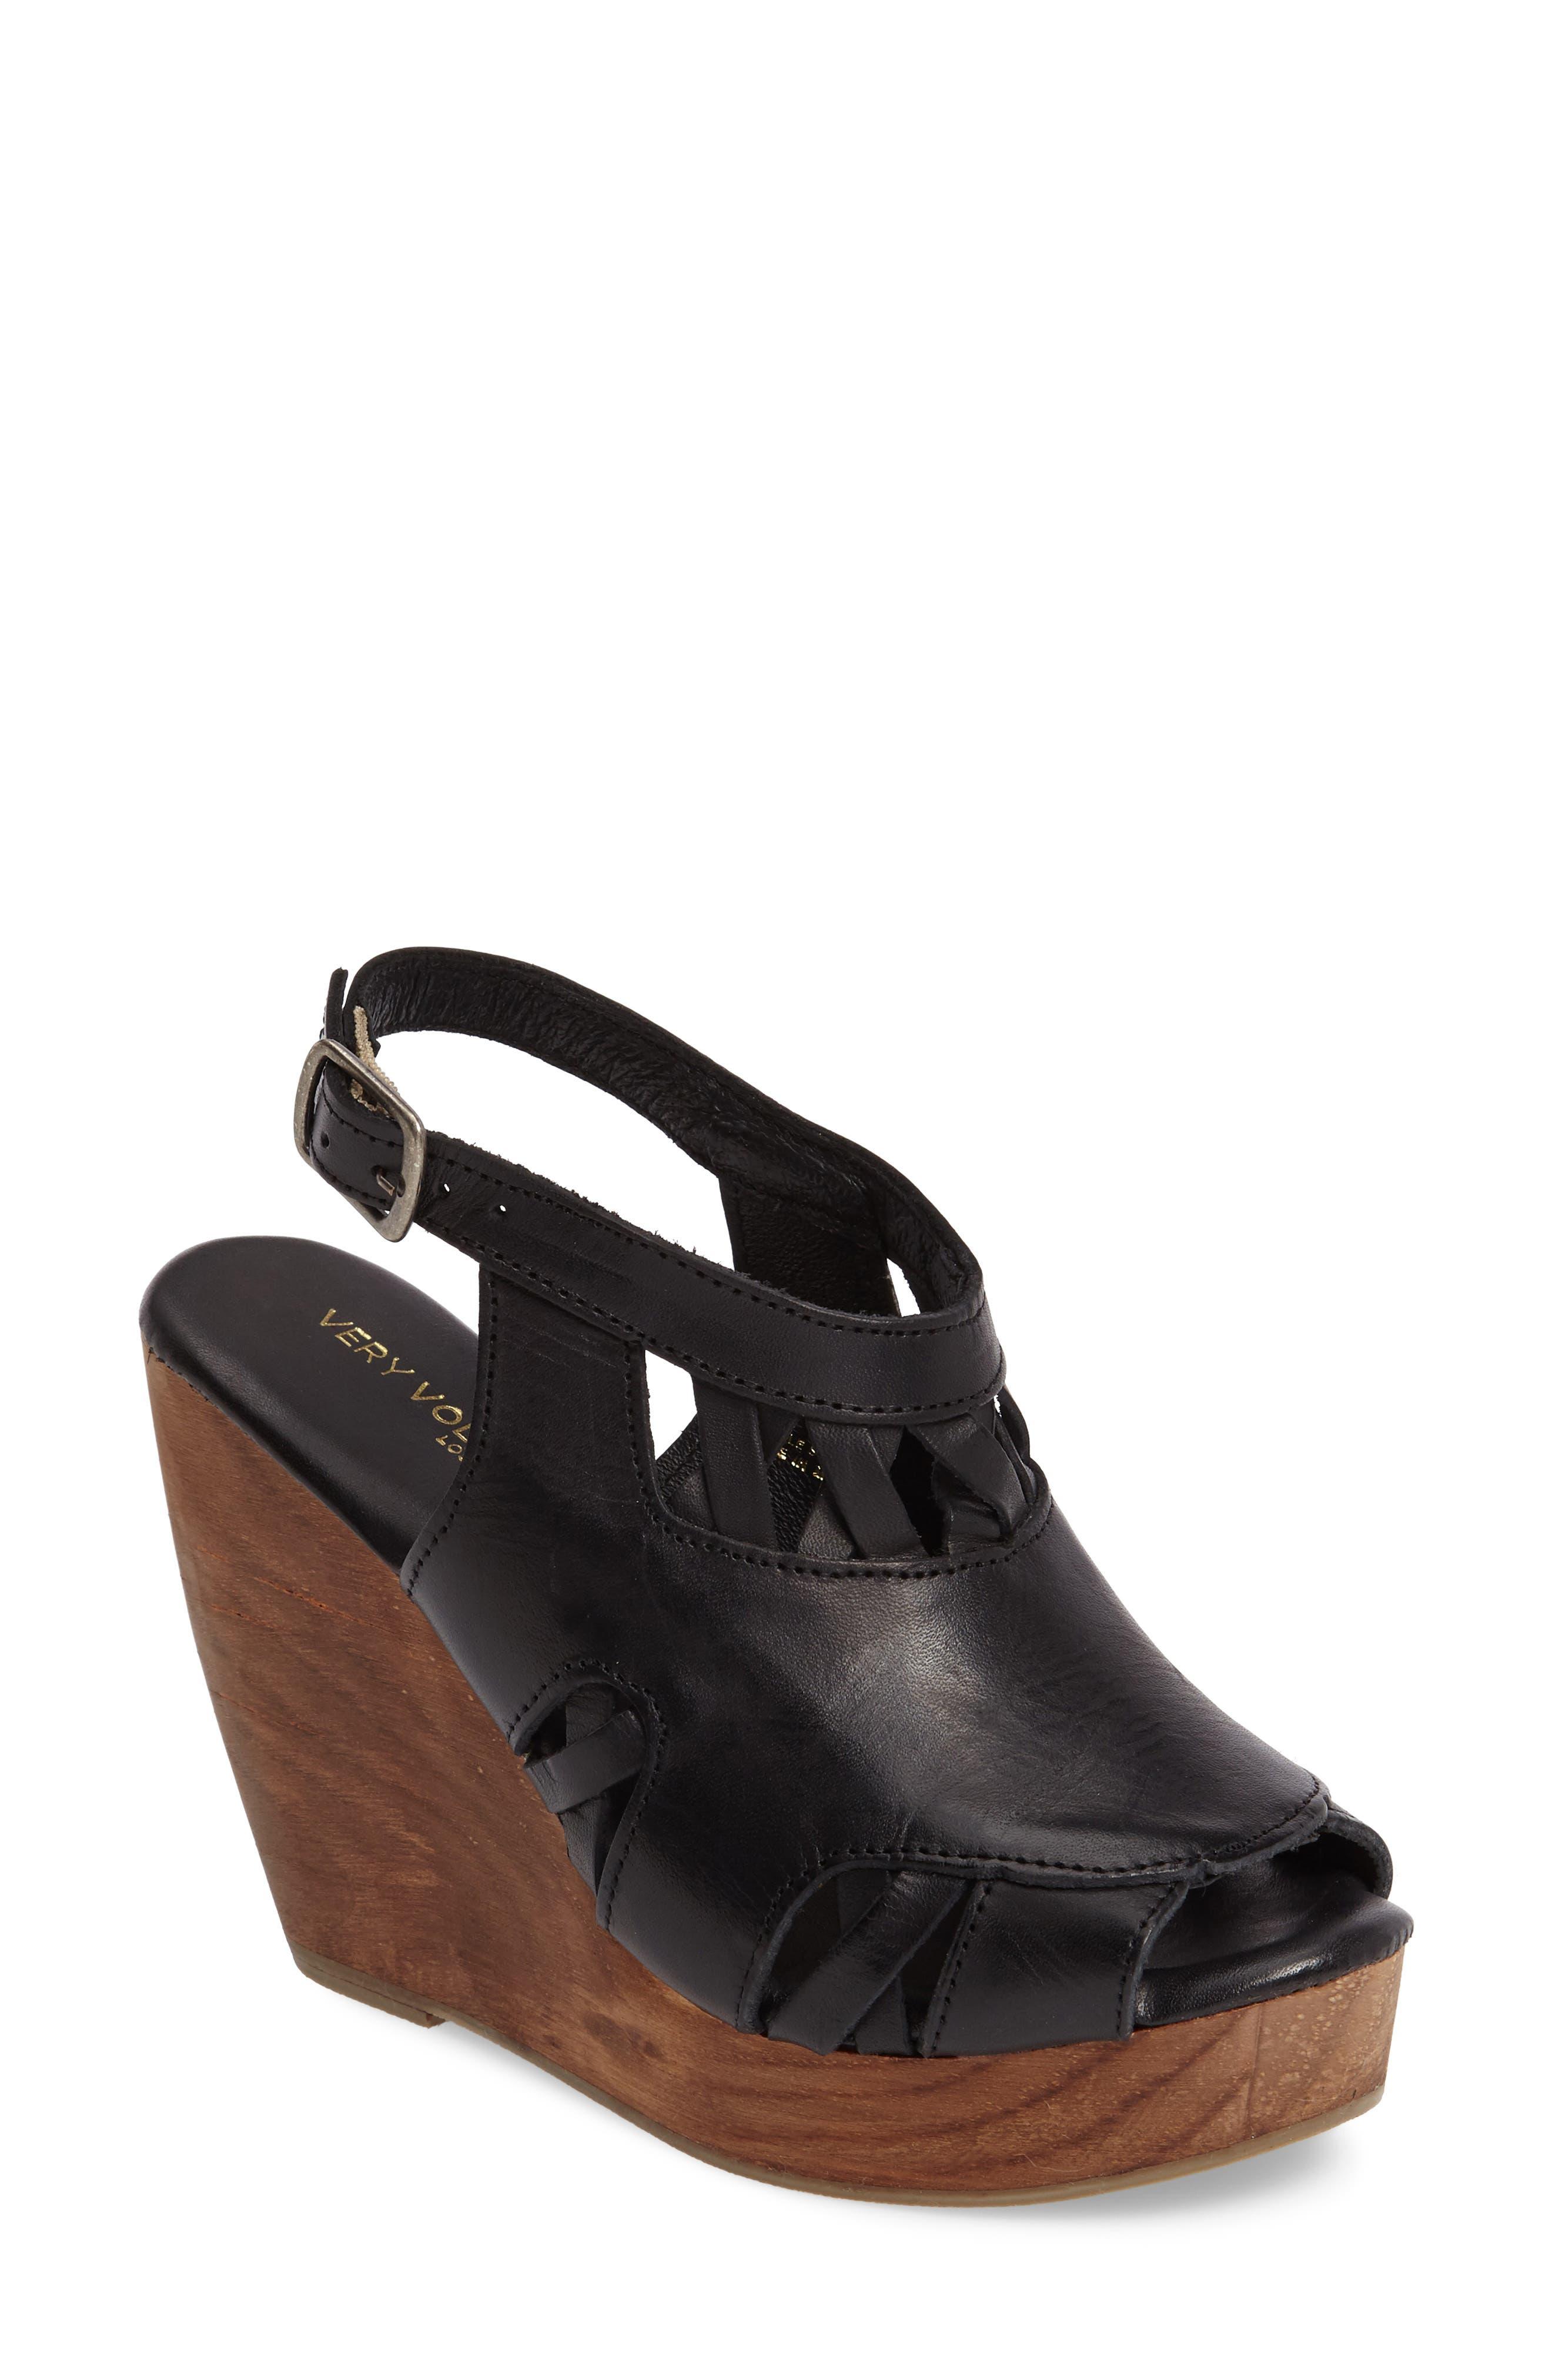 Alternate Image 1 Selected - Very Volatile Sloane Platform Wedge Sandal (Women)